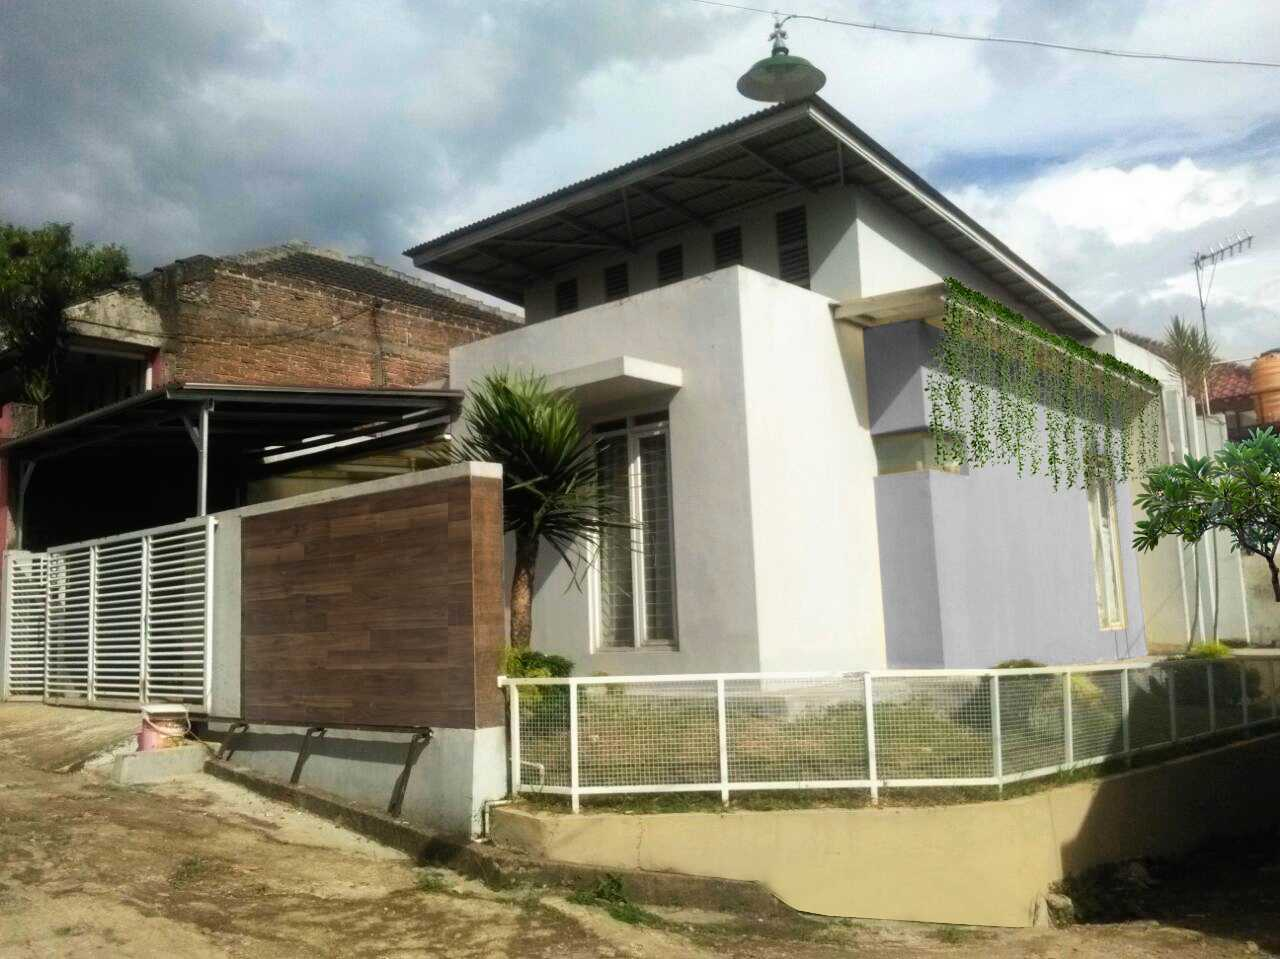 Daun Architect Rumah Tinggal Mini Cimuncang Bandung, Kota Bandung, Jawa Barat, Indonesia Bandung, Kota Bandung, Jawa Barat, Indonesia Daun-Architect-Rumah-Tinggal-Mini-Cimuncang   64541